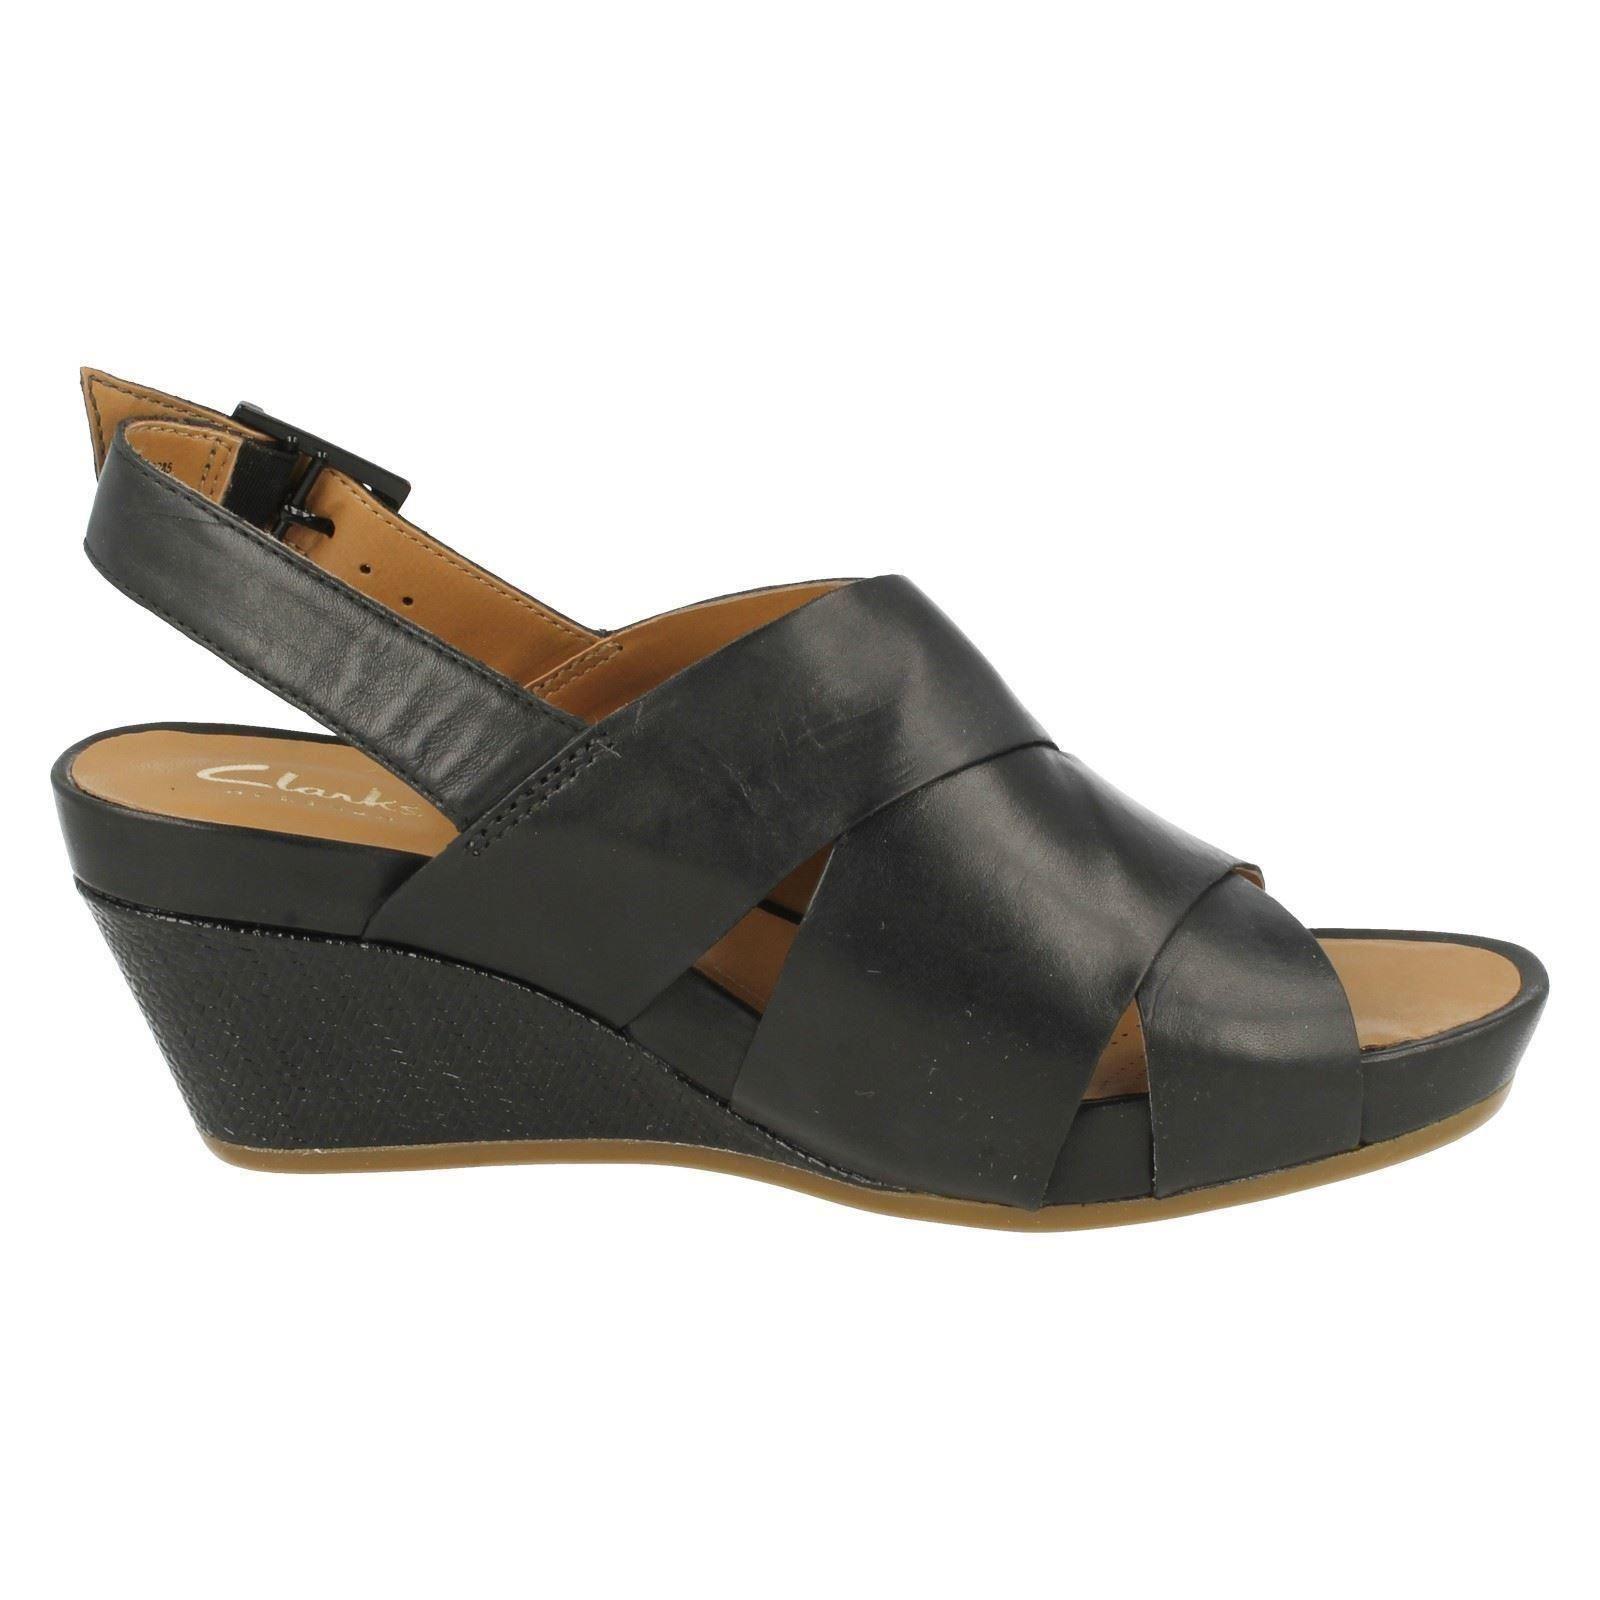 Ladies Ladies Ladies Clarks Sandals 'Rusty Rizz' 48bcfc